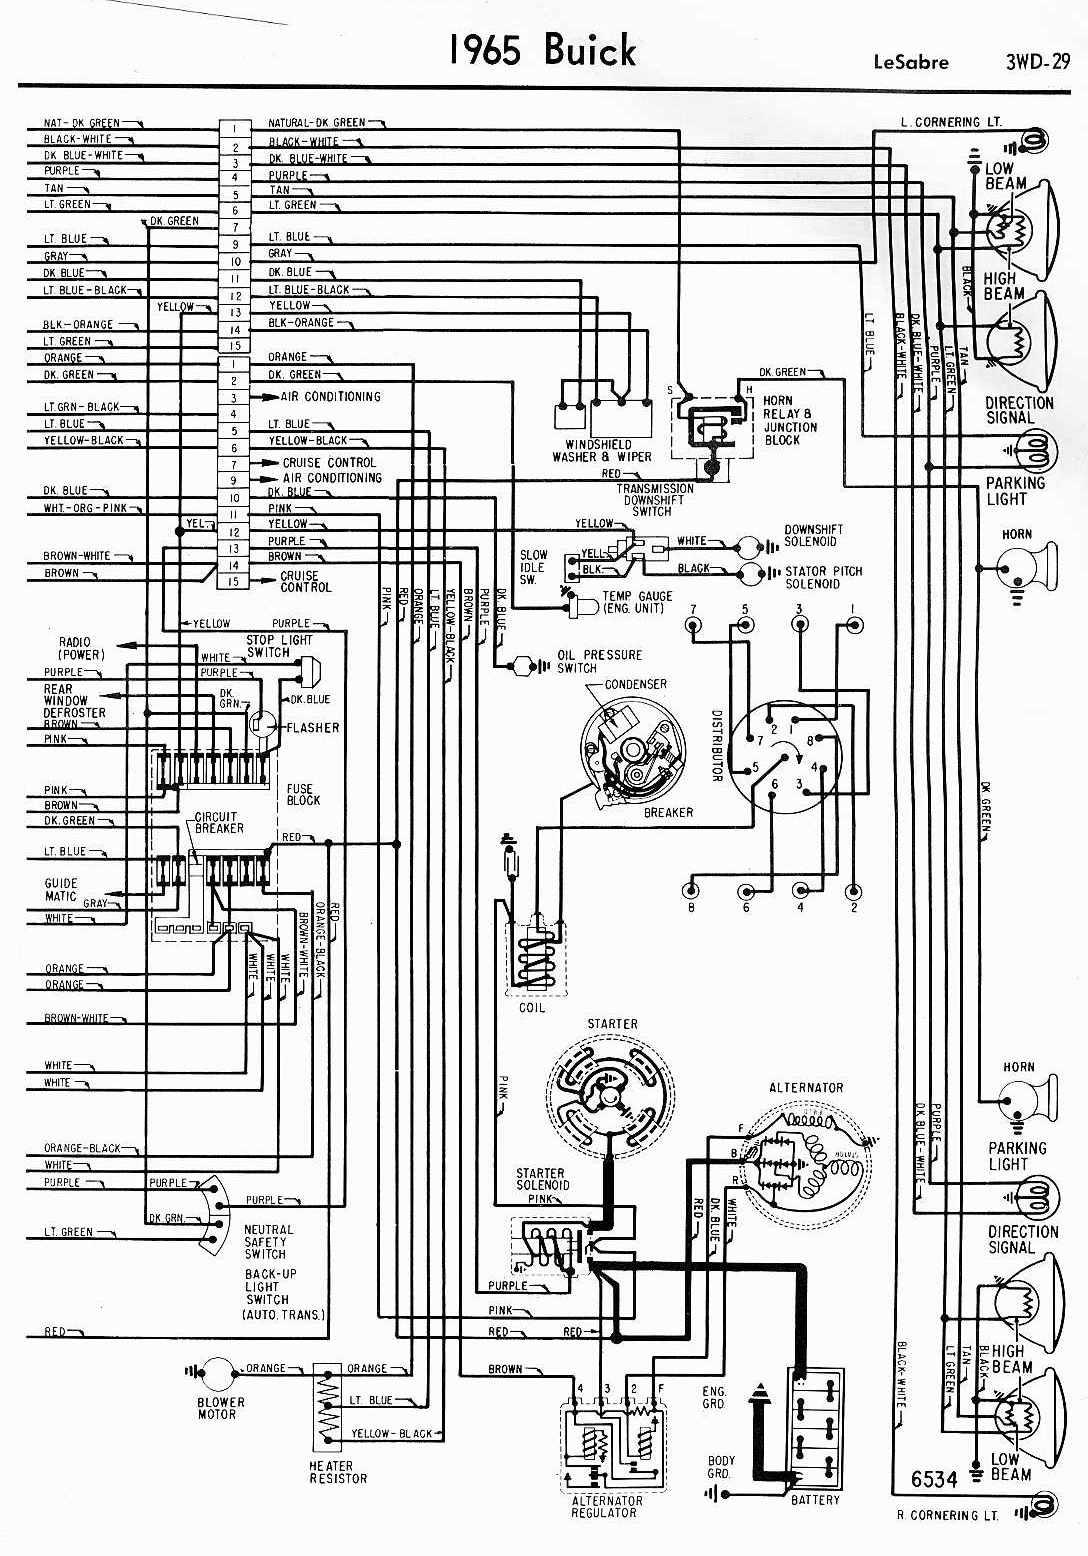 Electrical Wiring Diagram For 1941 1946 Studebaker President